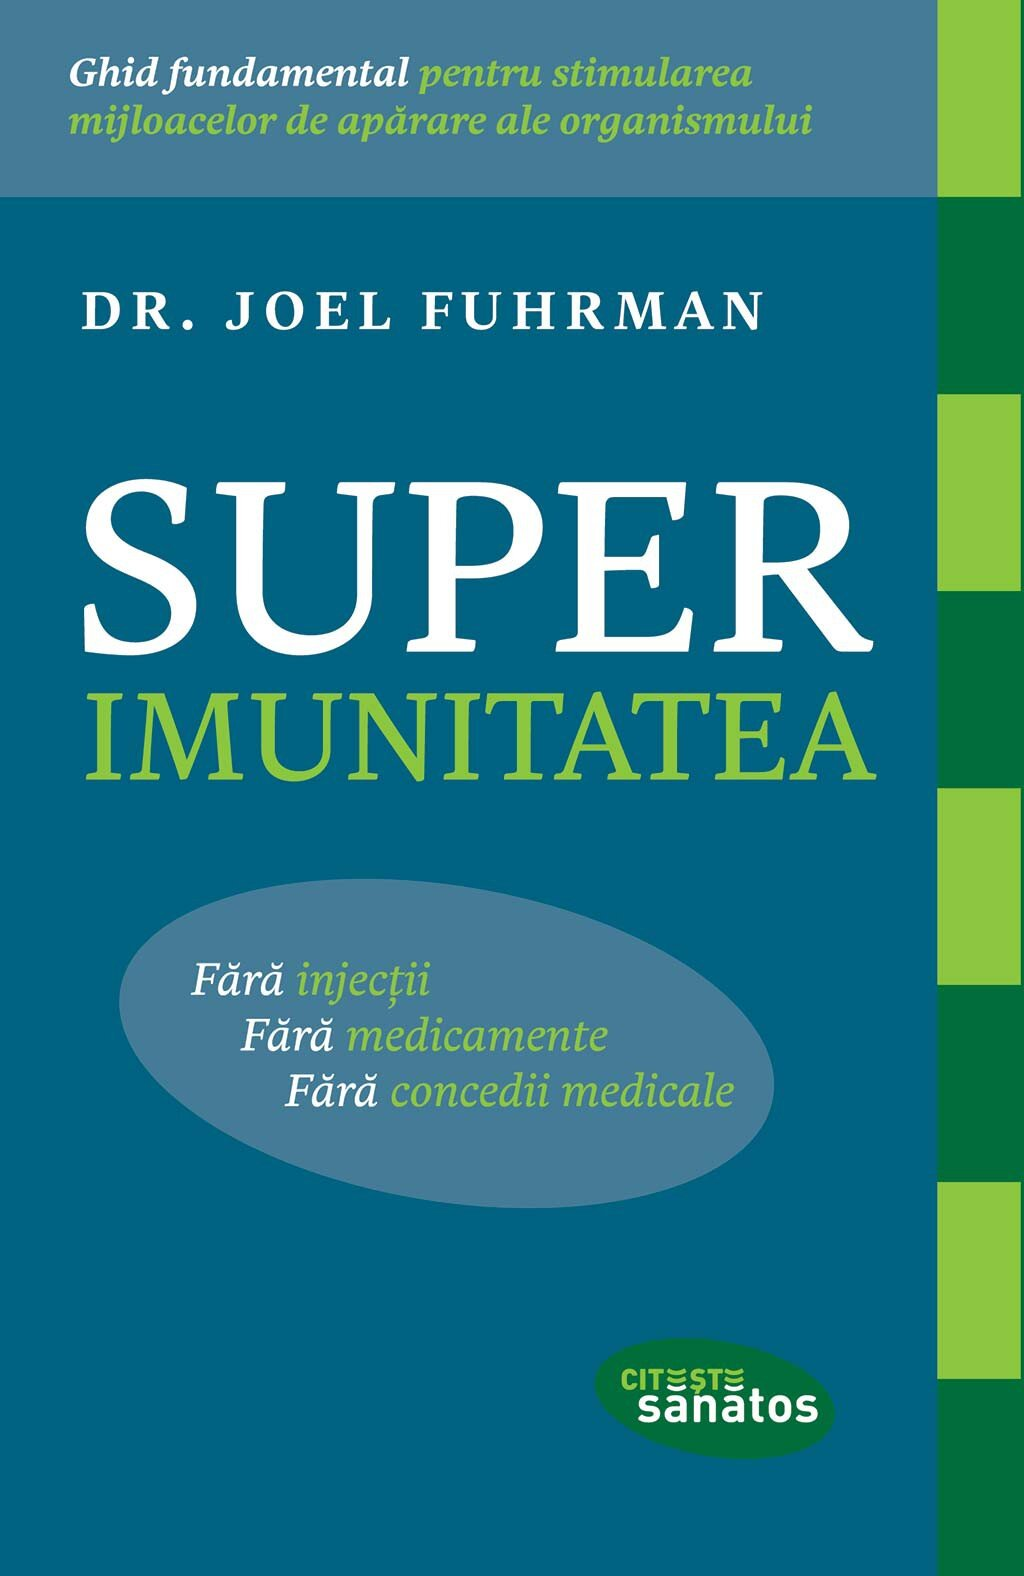 Superimunitatea. Fara injectii, fara medicamente, fara concedii medicale (eBook)